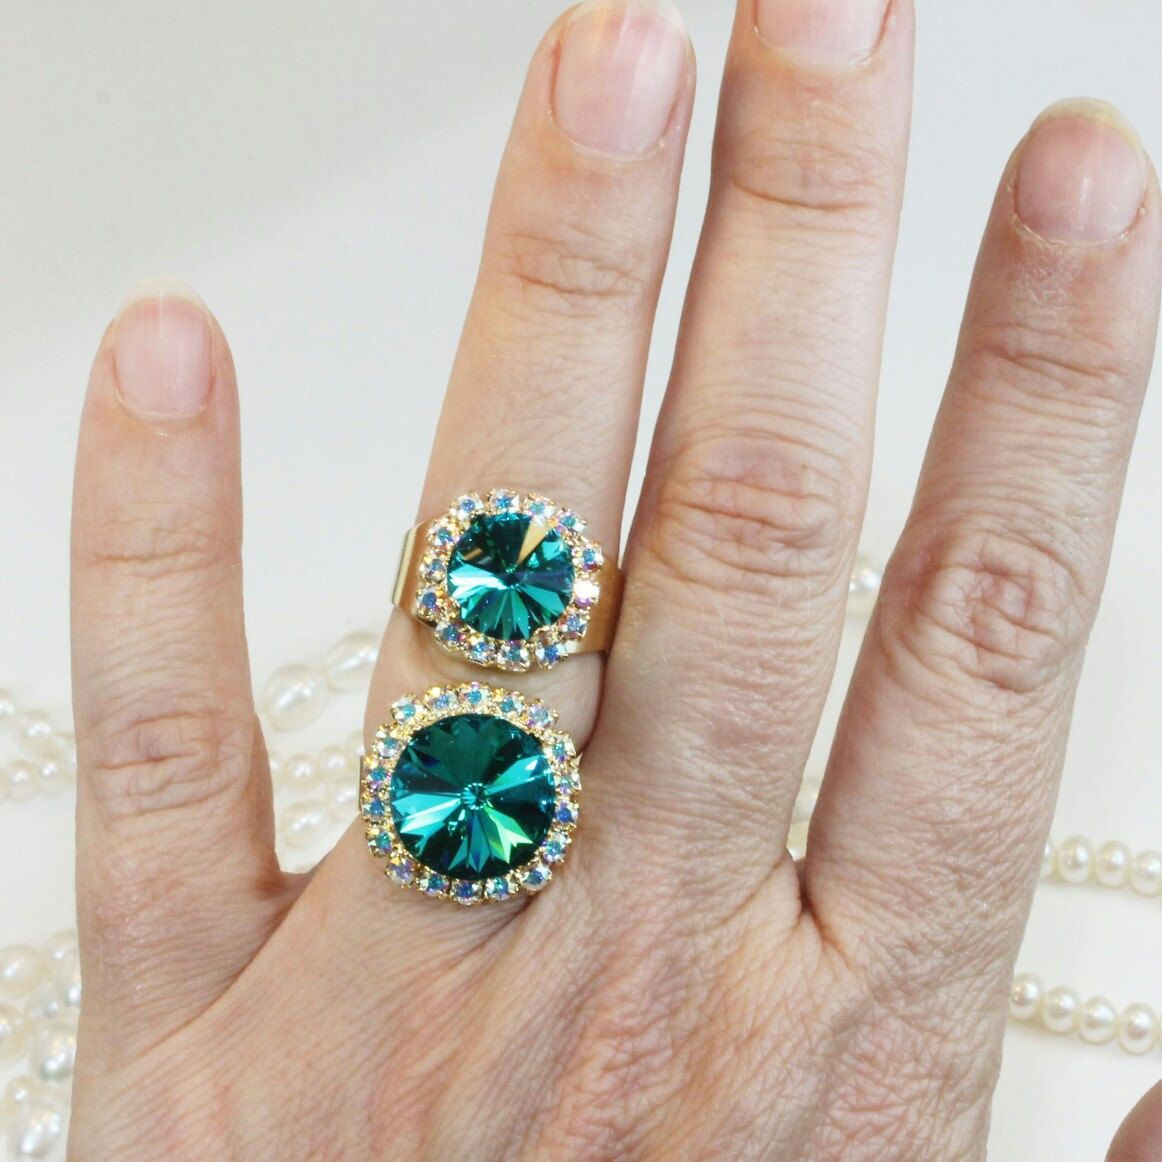 Teal Crystal Ring Peacock Green Swarovski Cocktail Bridal